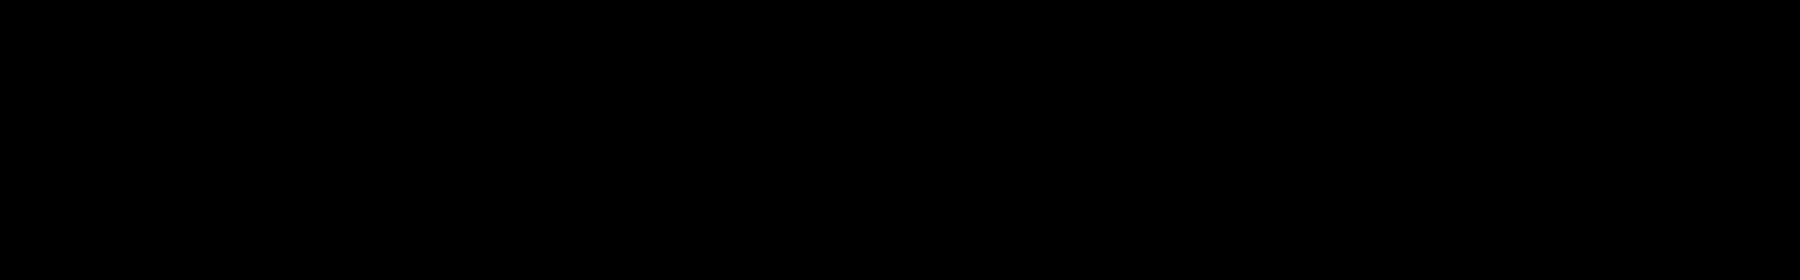 Cinematic Metal - CONSTRUCTION KIT audio waveform